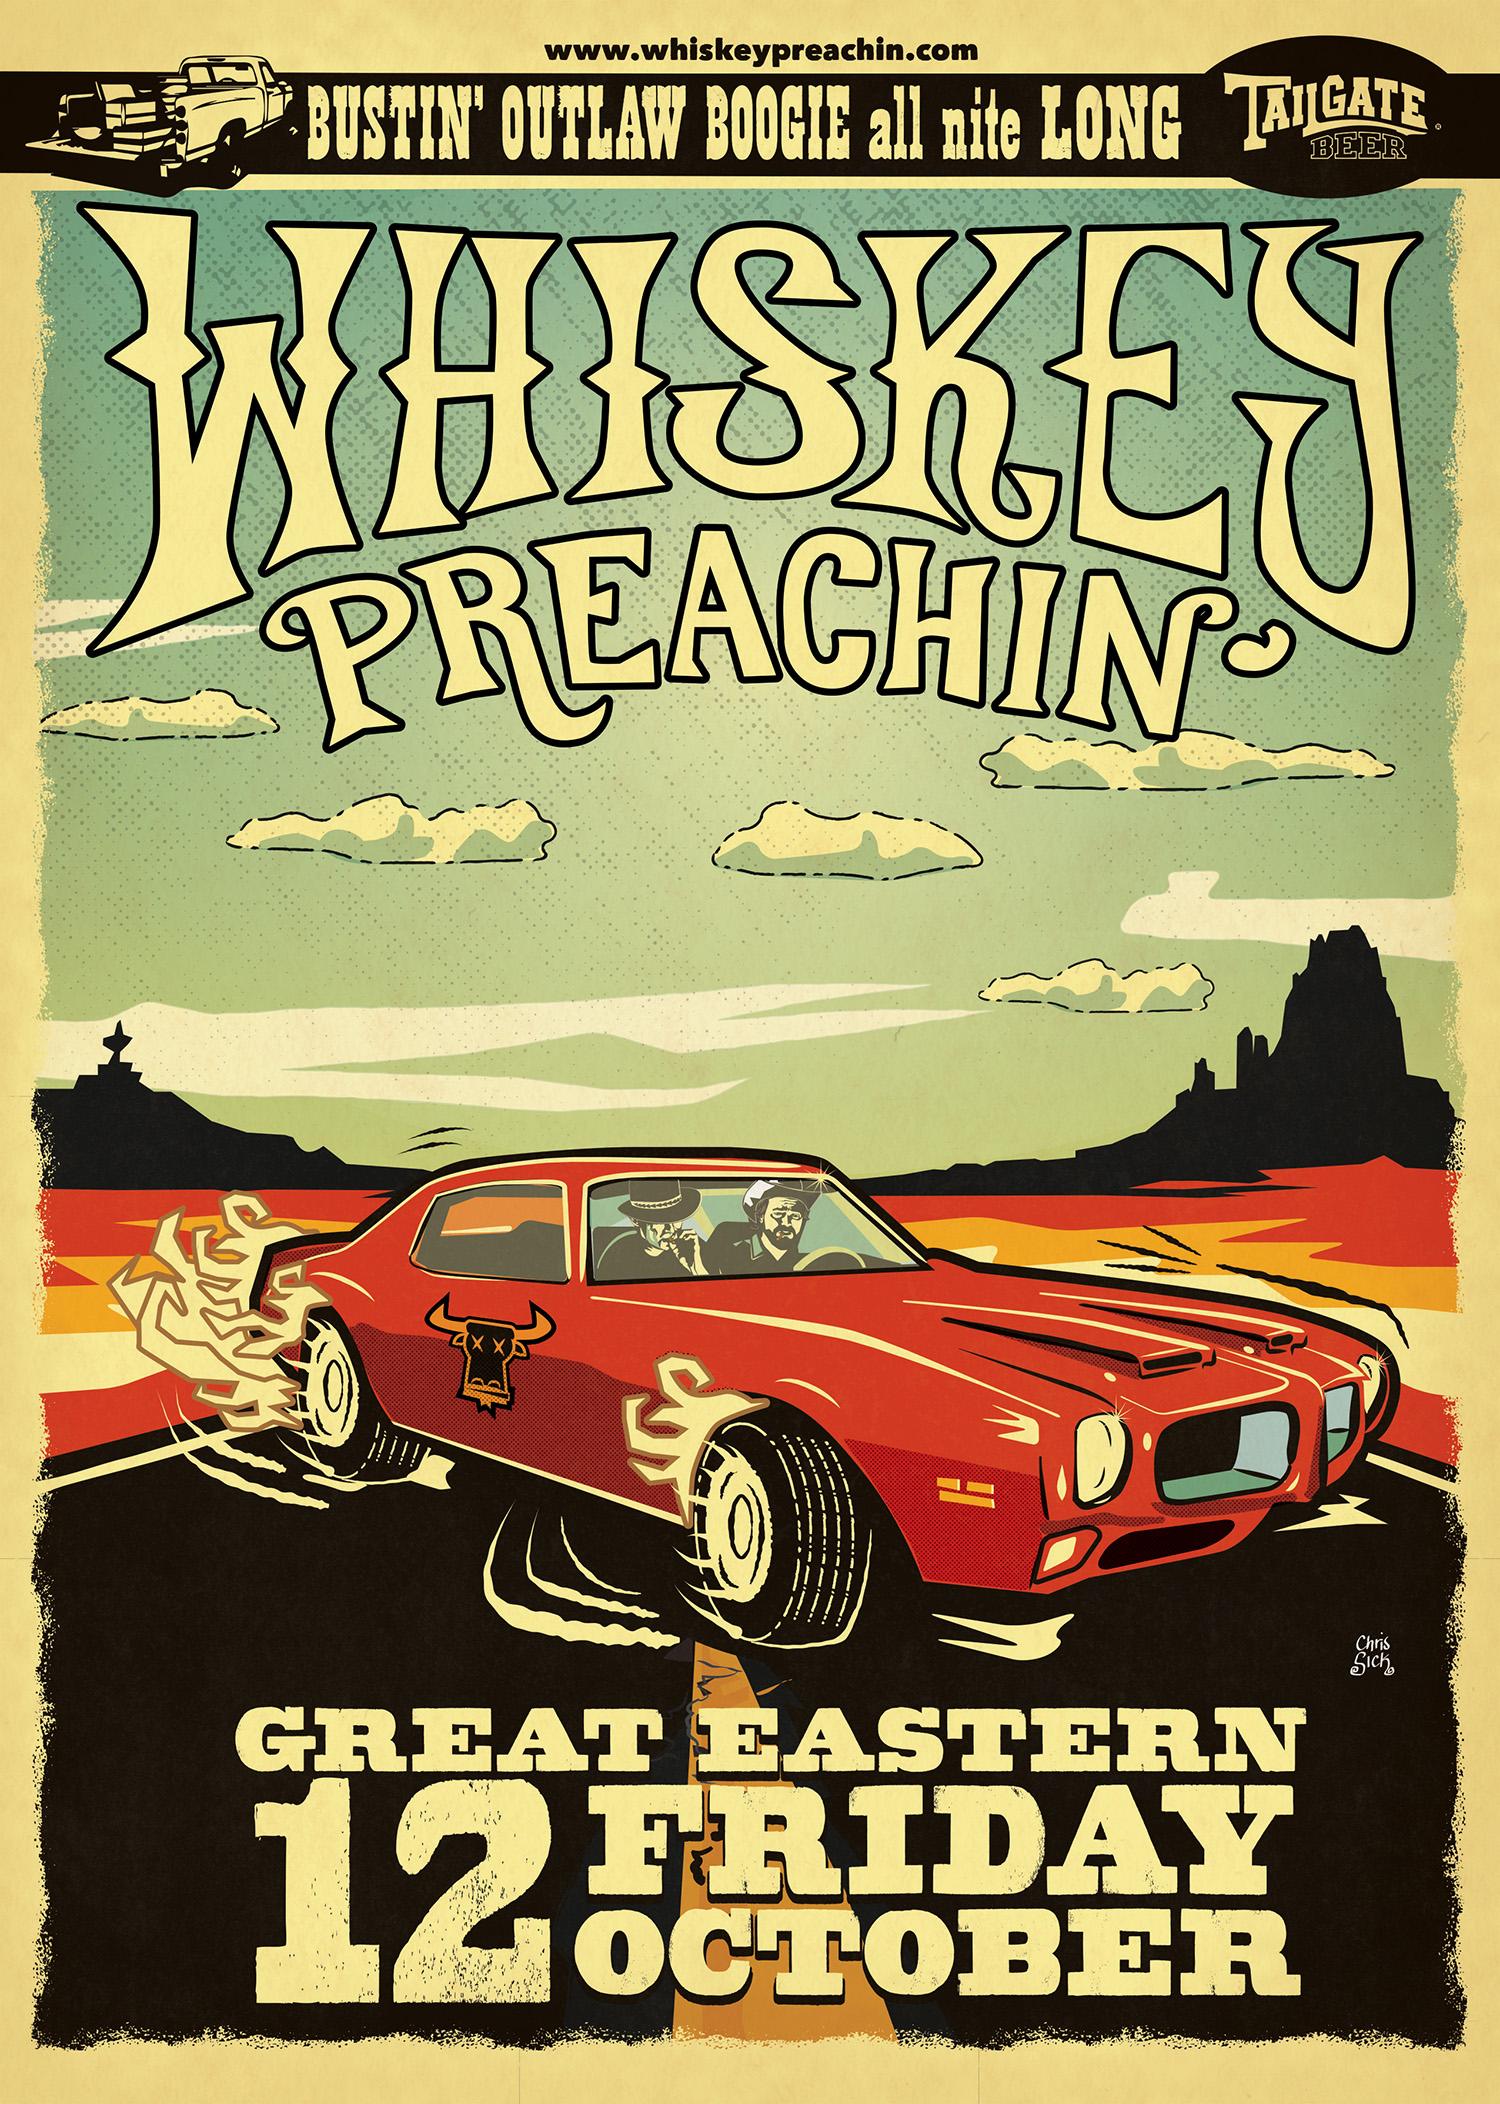 Whiskey-Preachin-October-2018.jpg